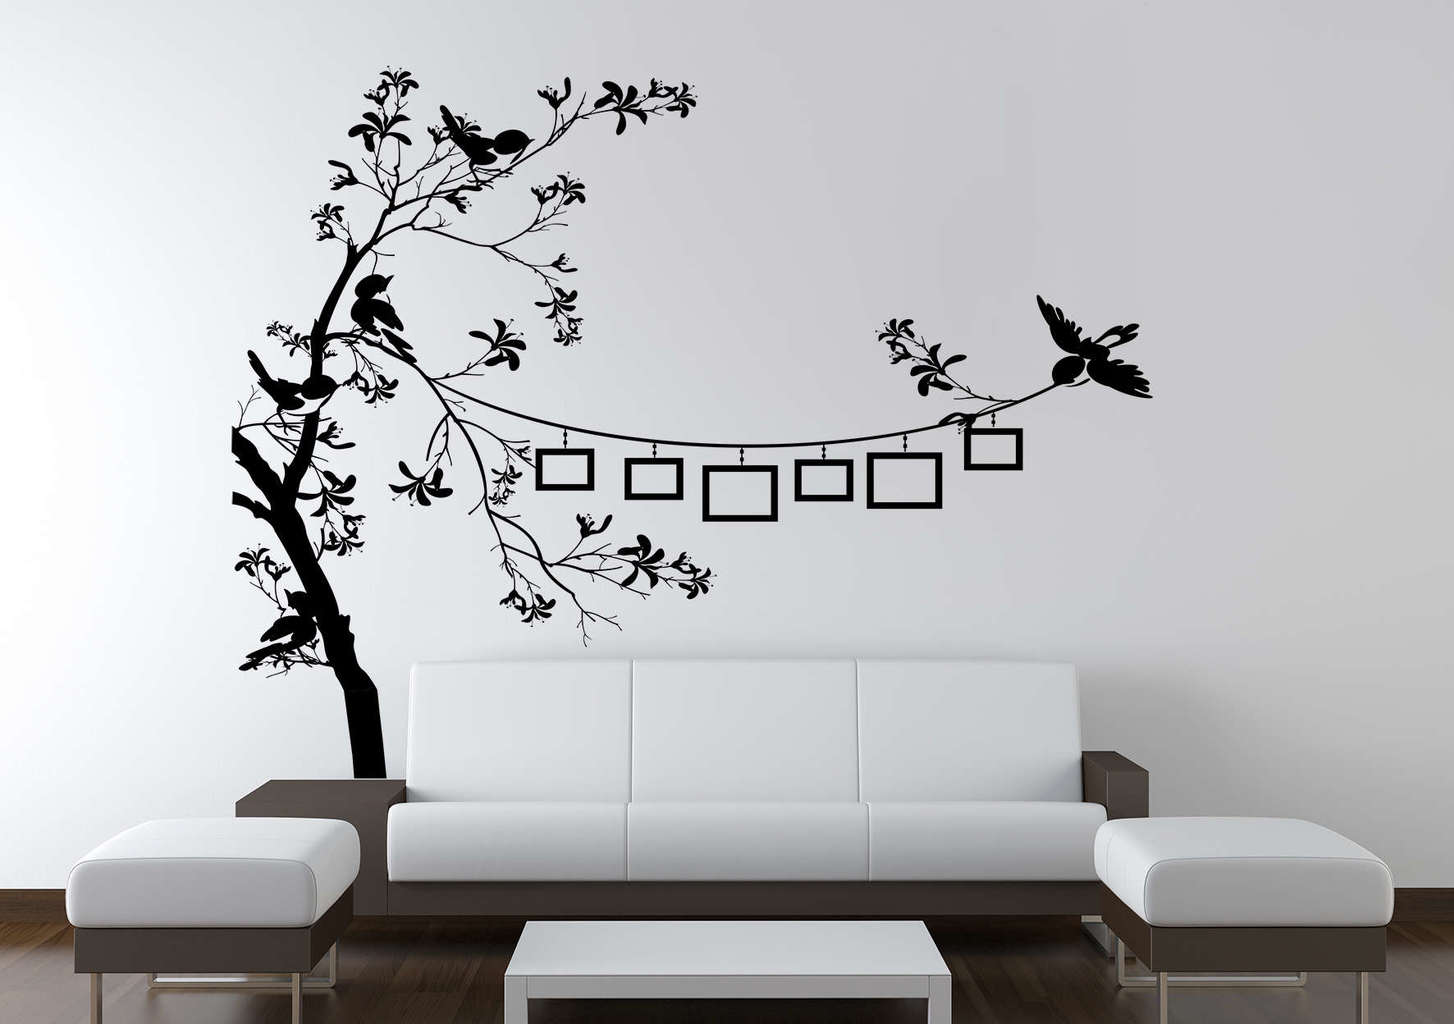 Bird photo frame tree wall decal